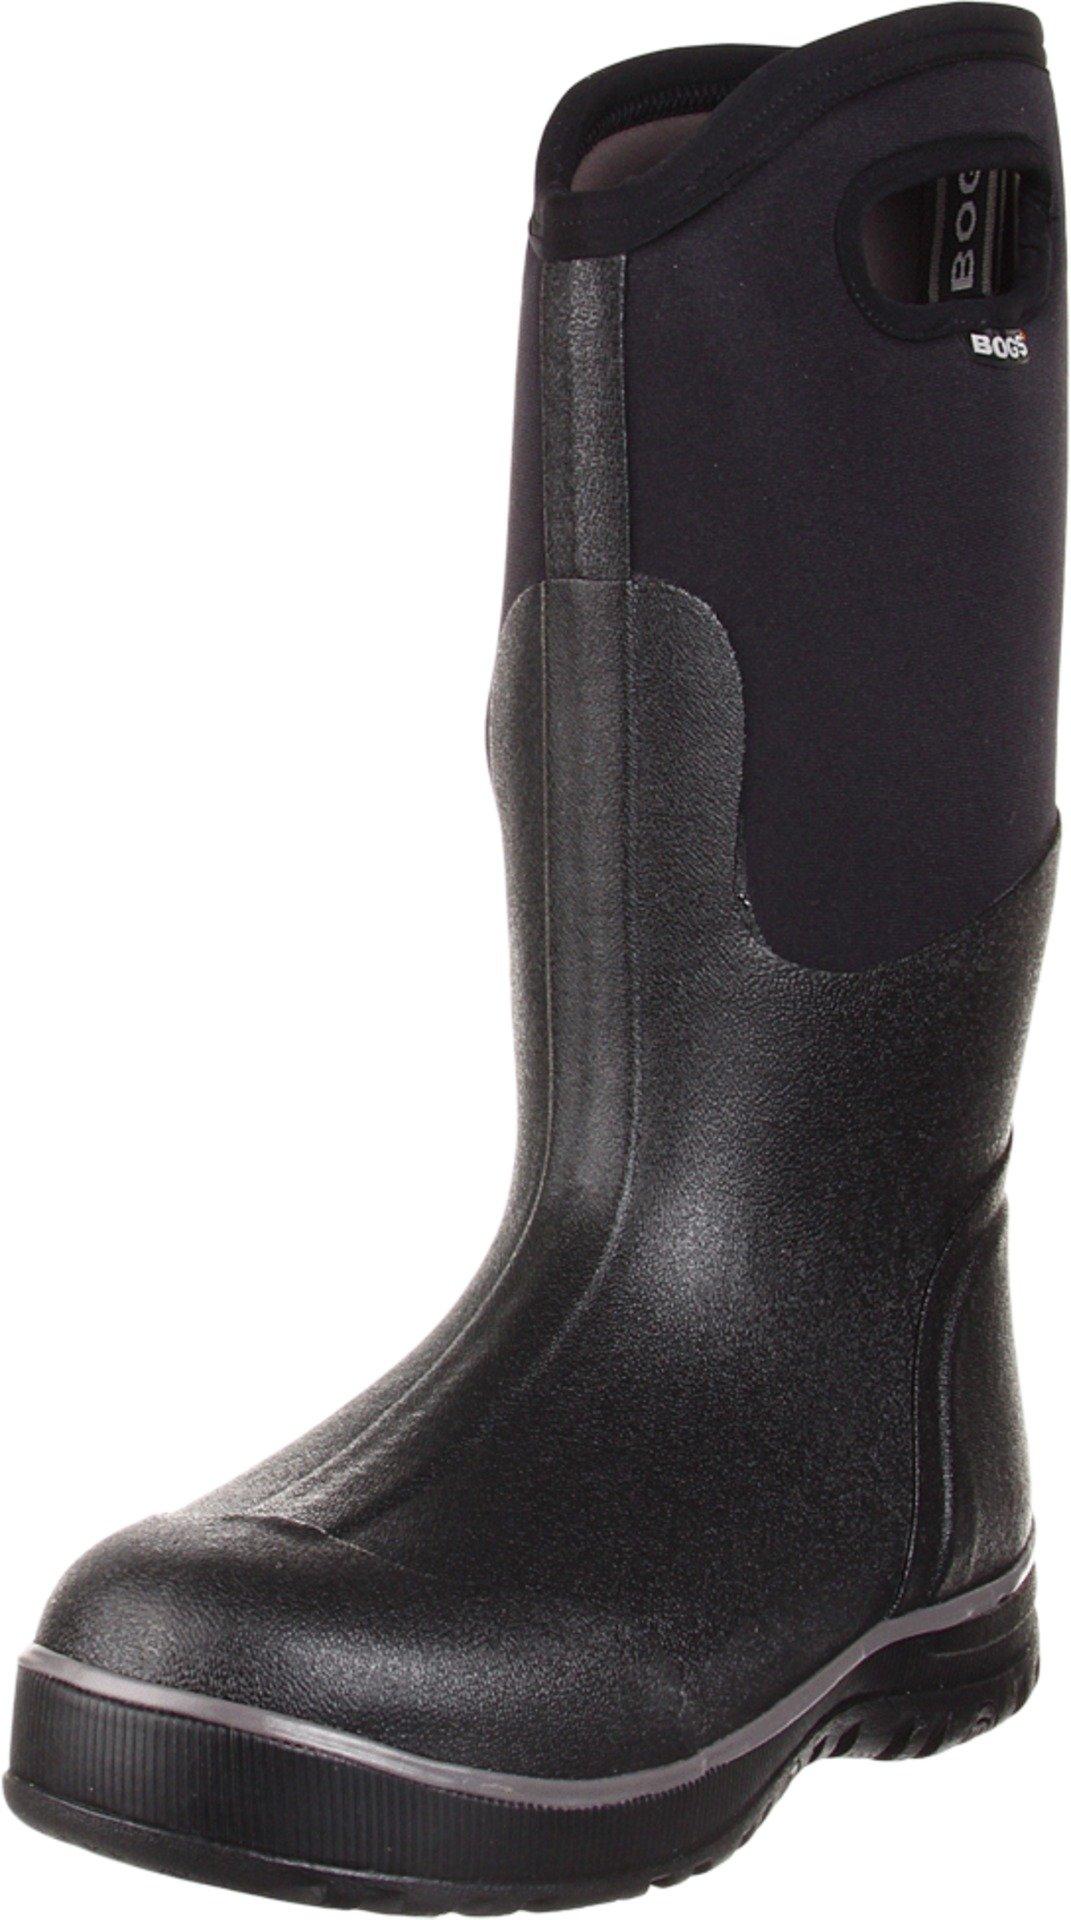 Bogs Men's Ultra High Insulated Waterproof Winter Boots - 11 D(M) US - Black